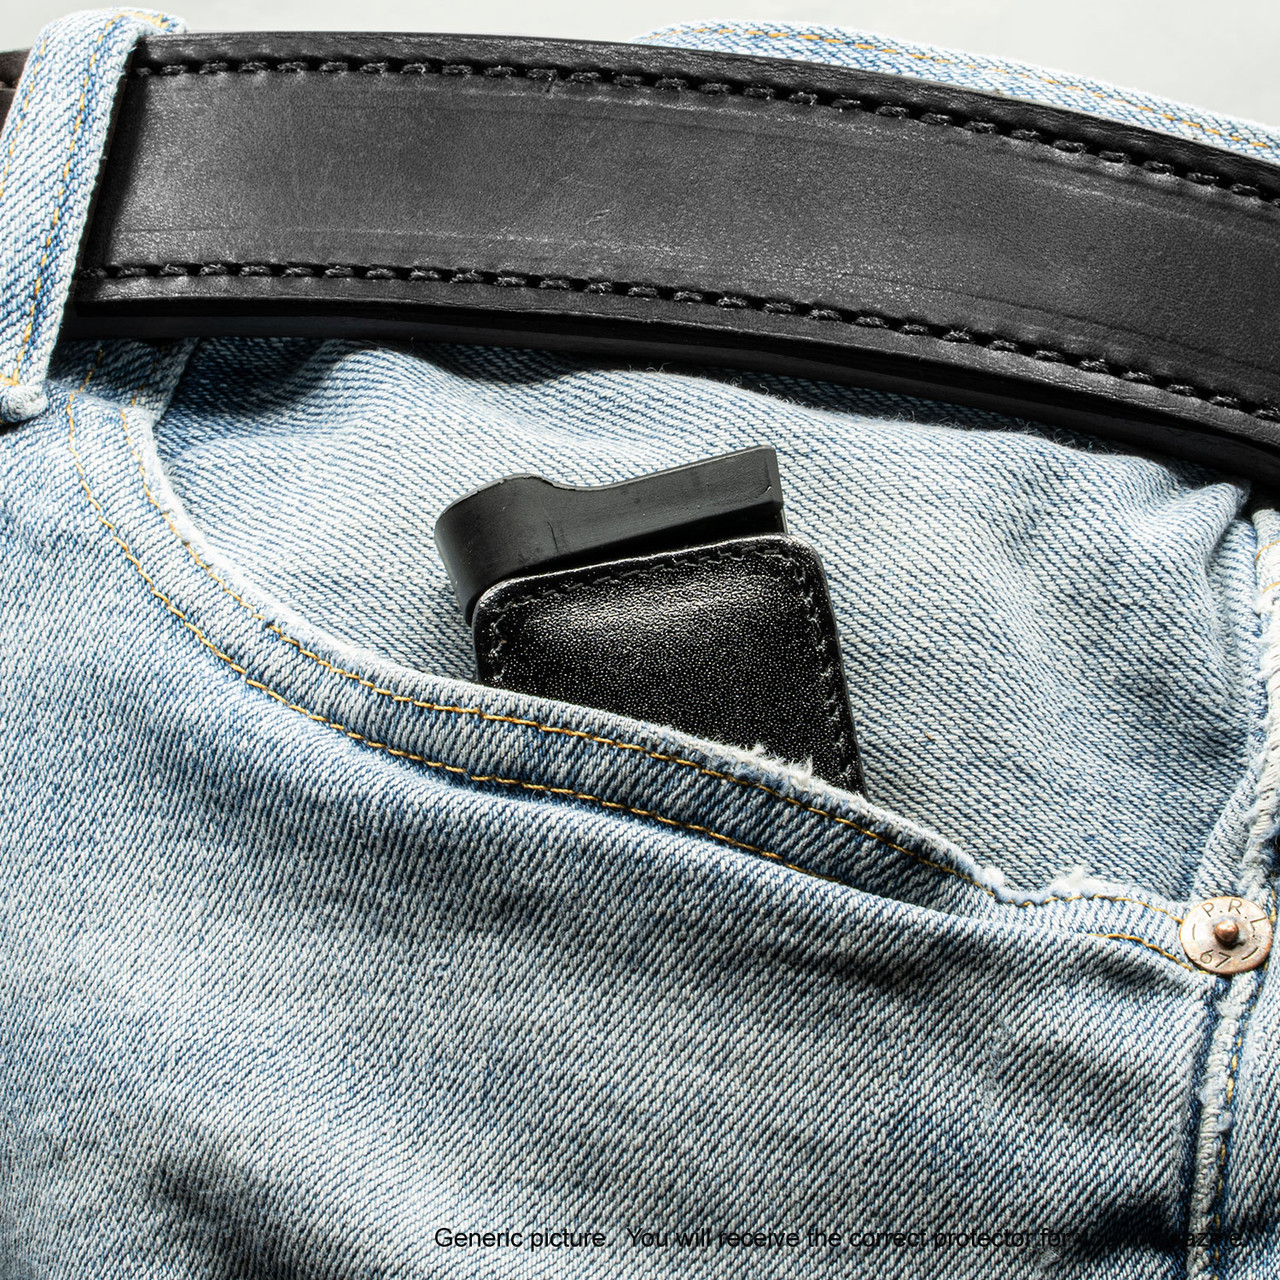 S&W SW9V Black Leather Magazine Pocket Protector